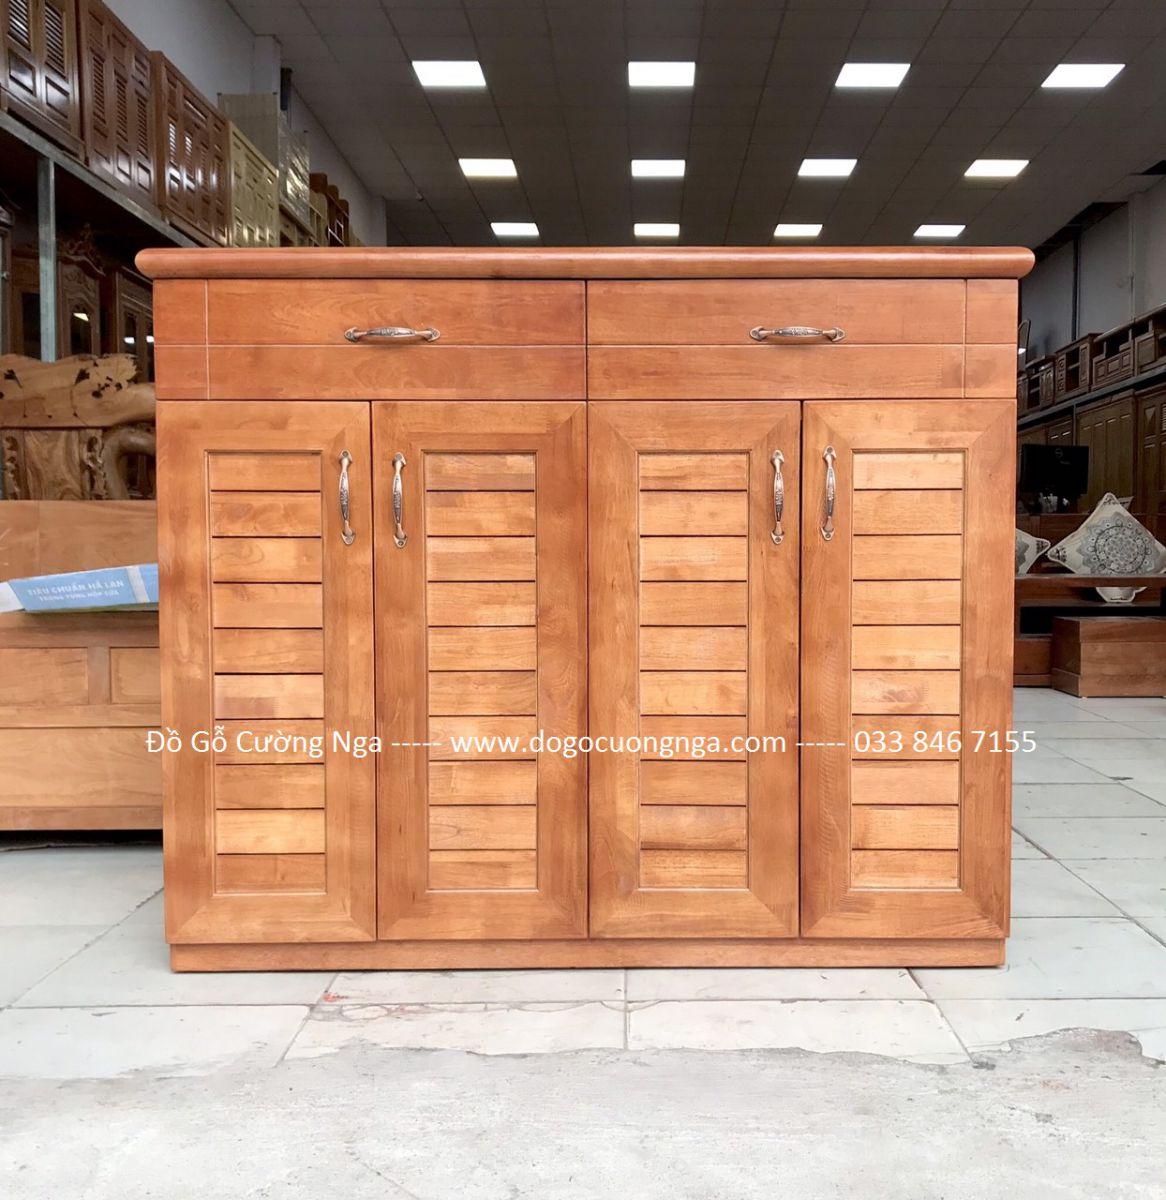 Tủ giày dép gỗ cao su 1m2